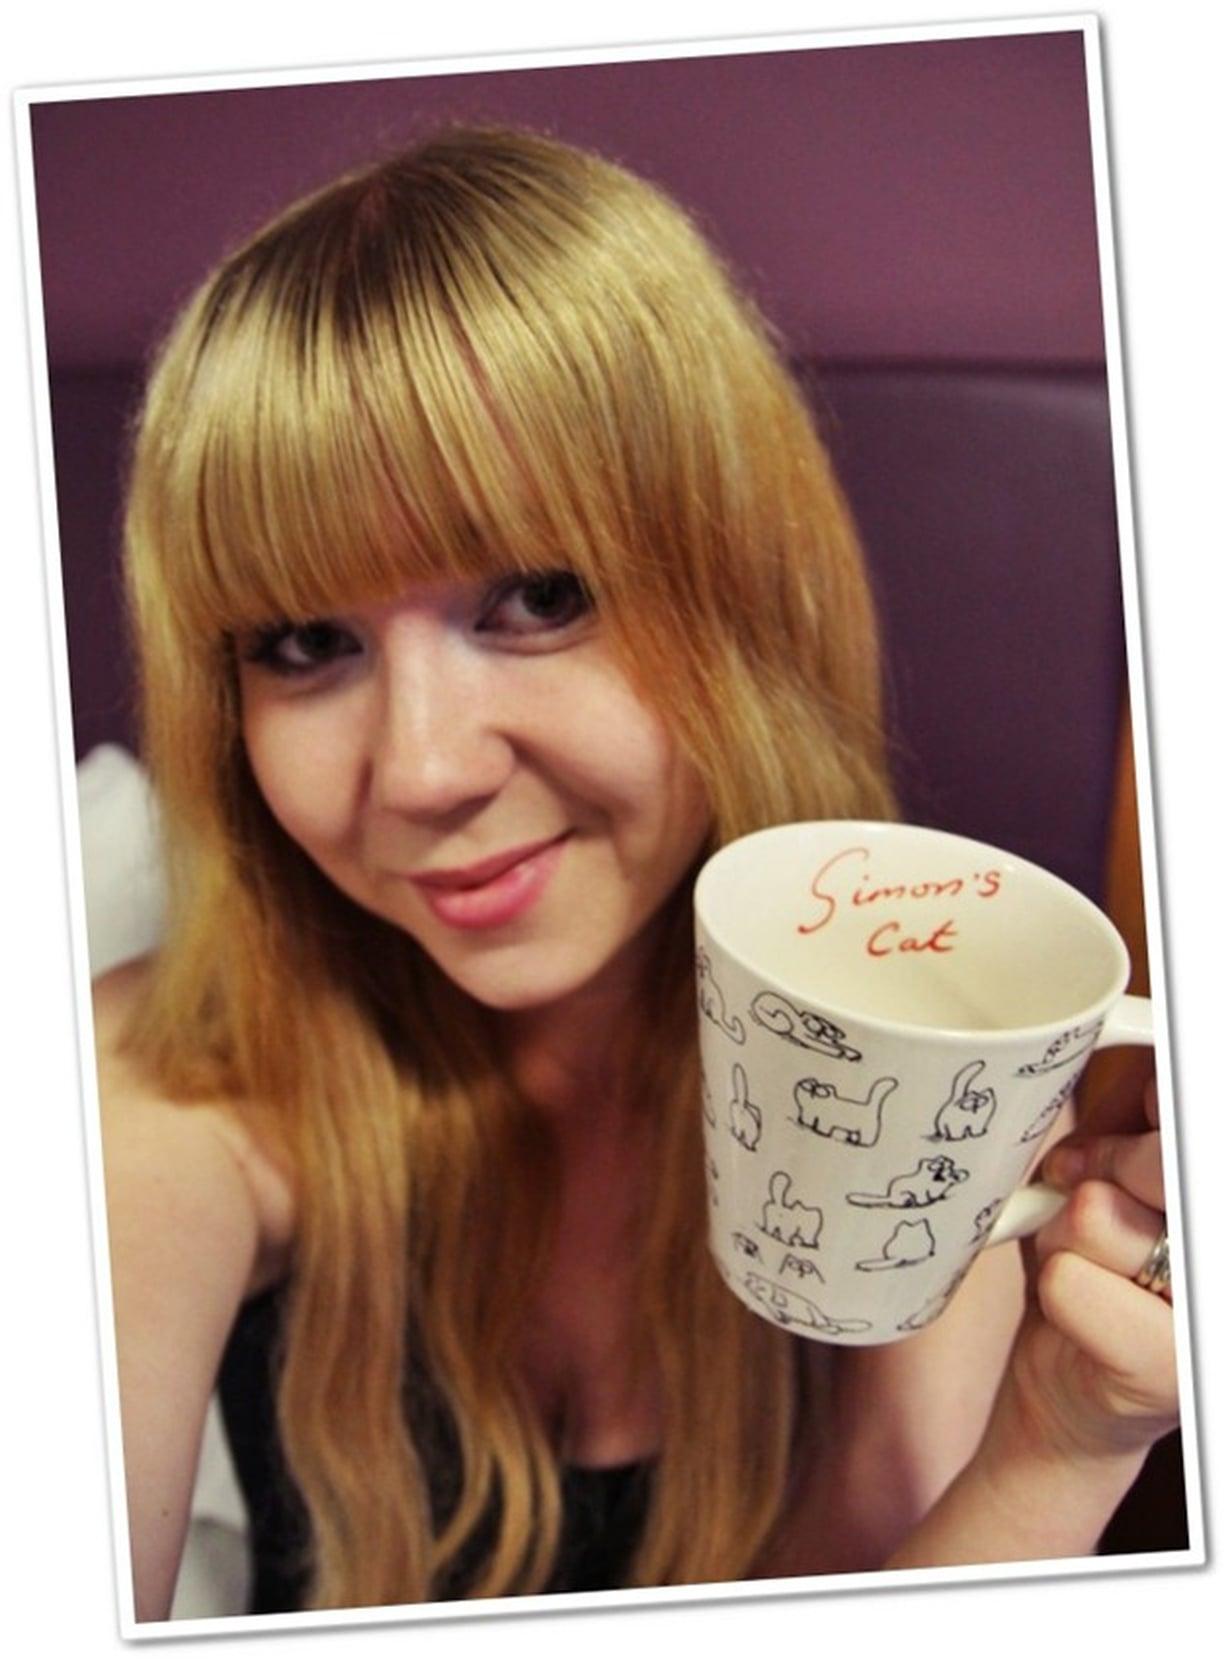 simons cat mug